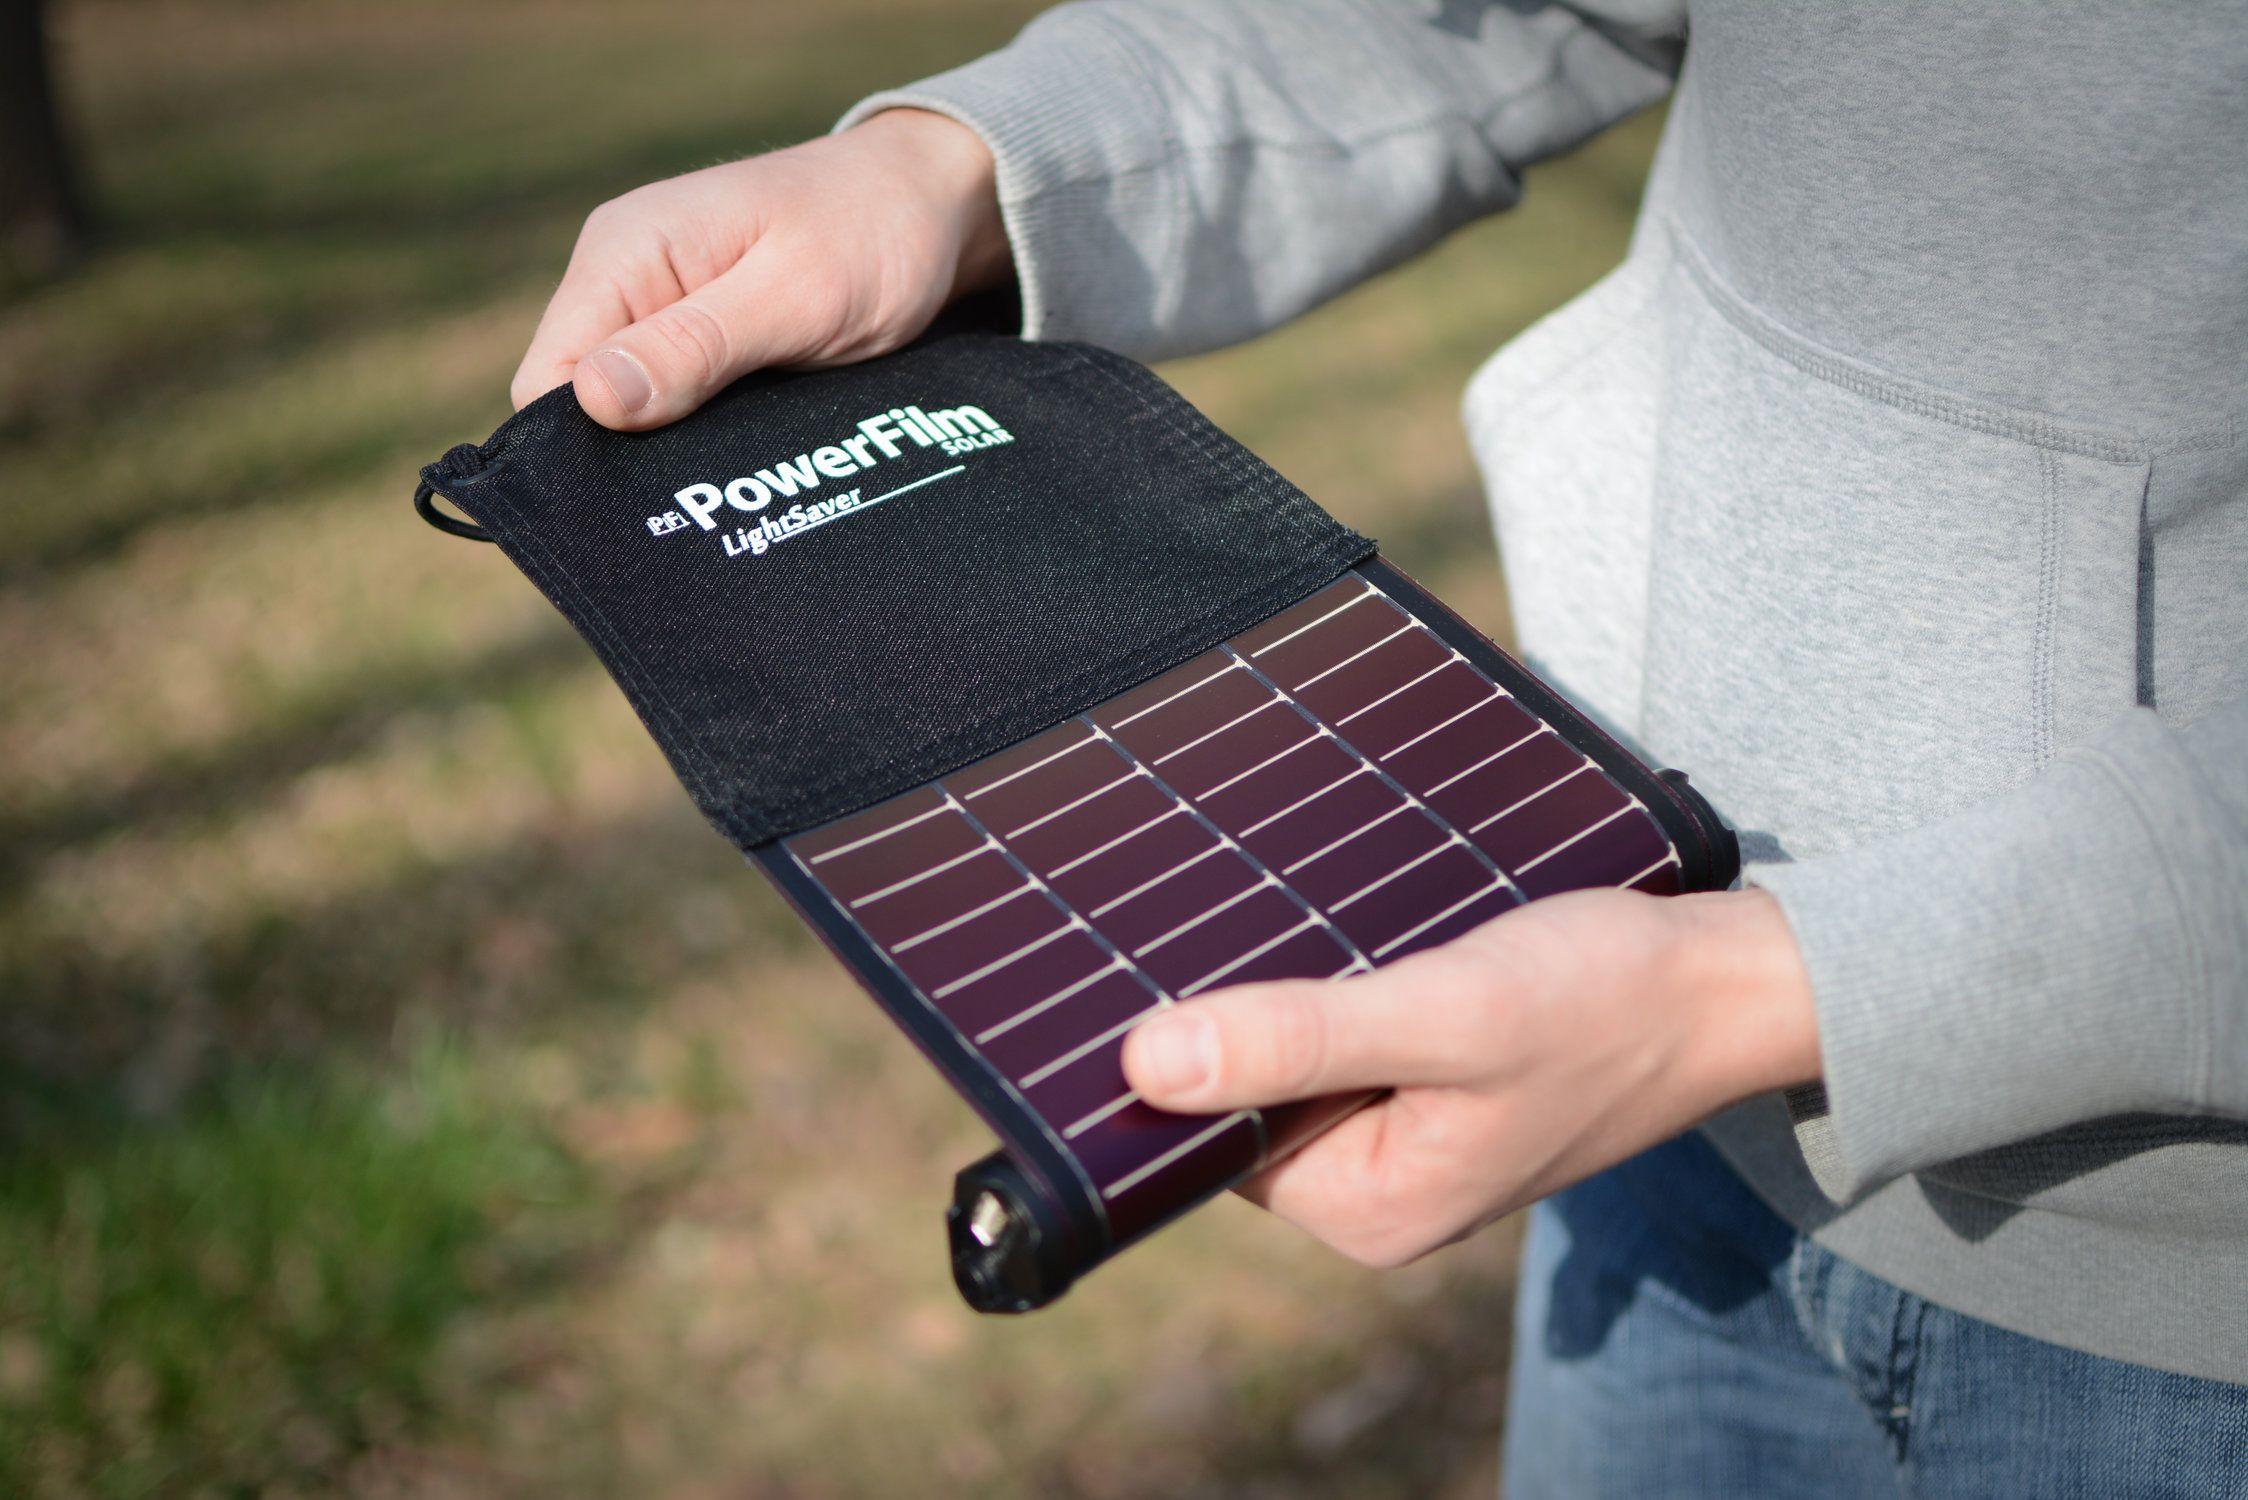 Powerfilm Lightweight Thin Flexible Solar Panels Flexible Solar Panels Solar Charger Portable Solar Energy Panels